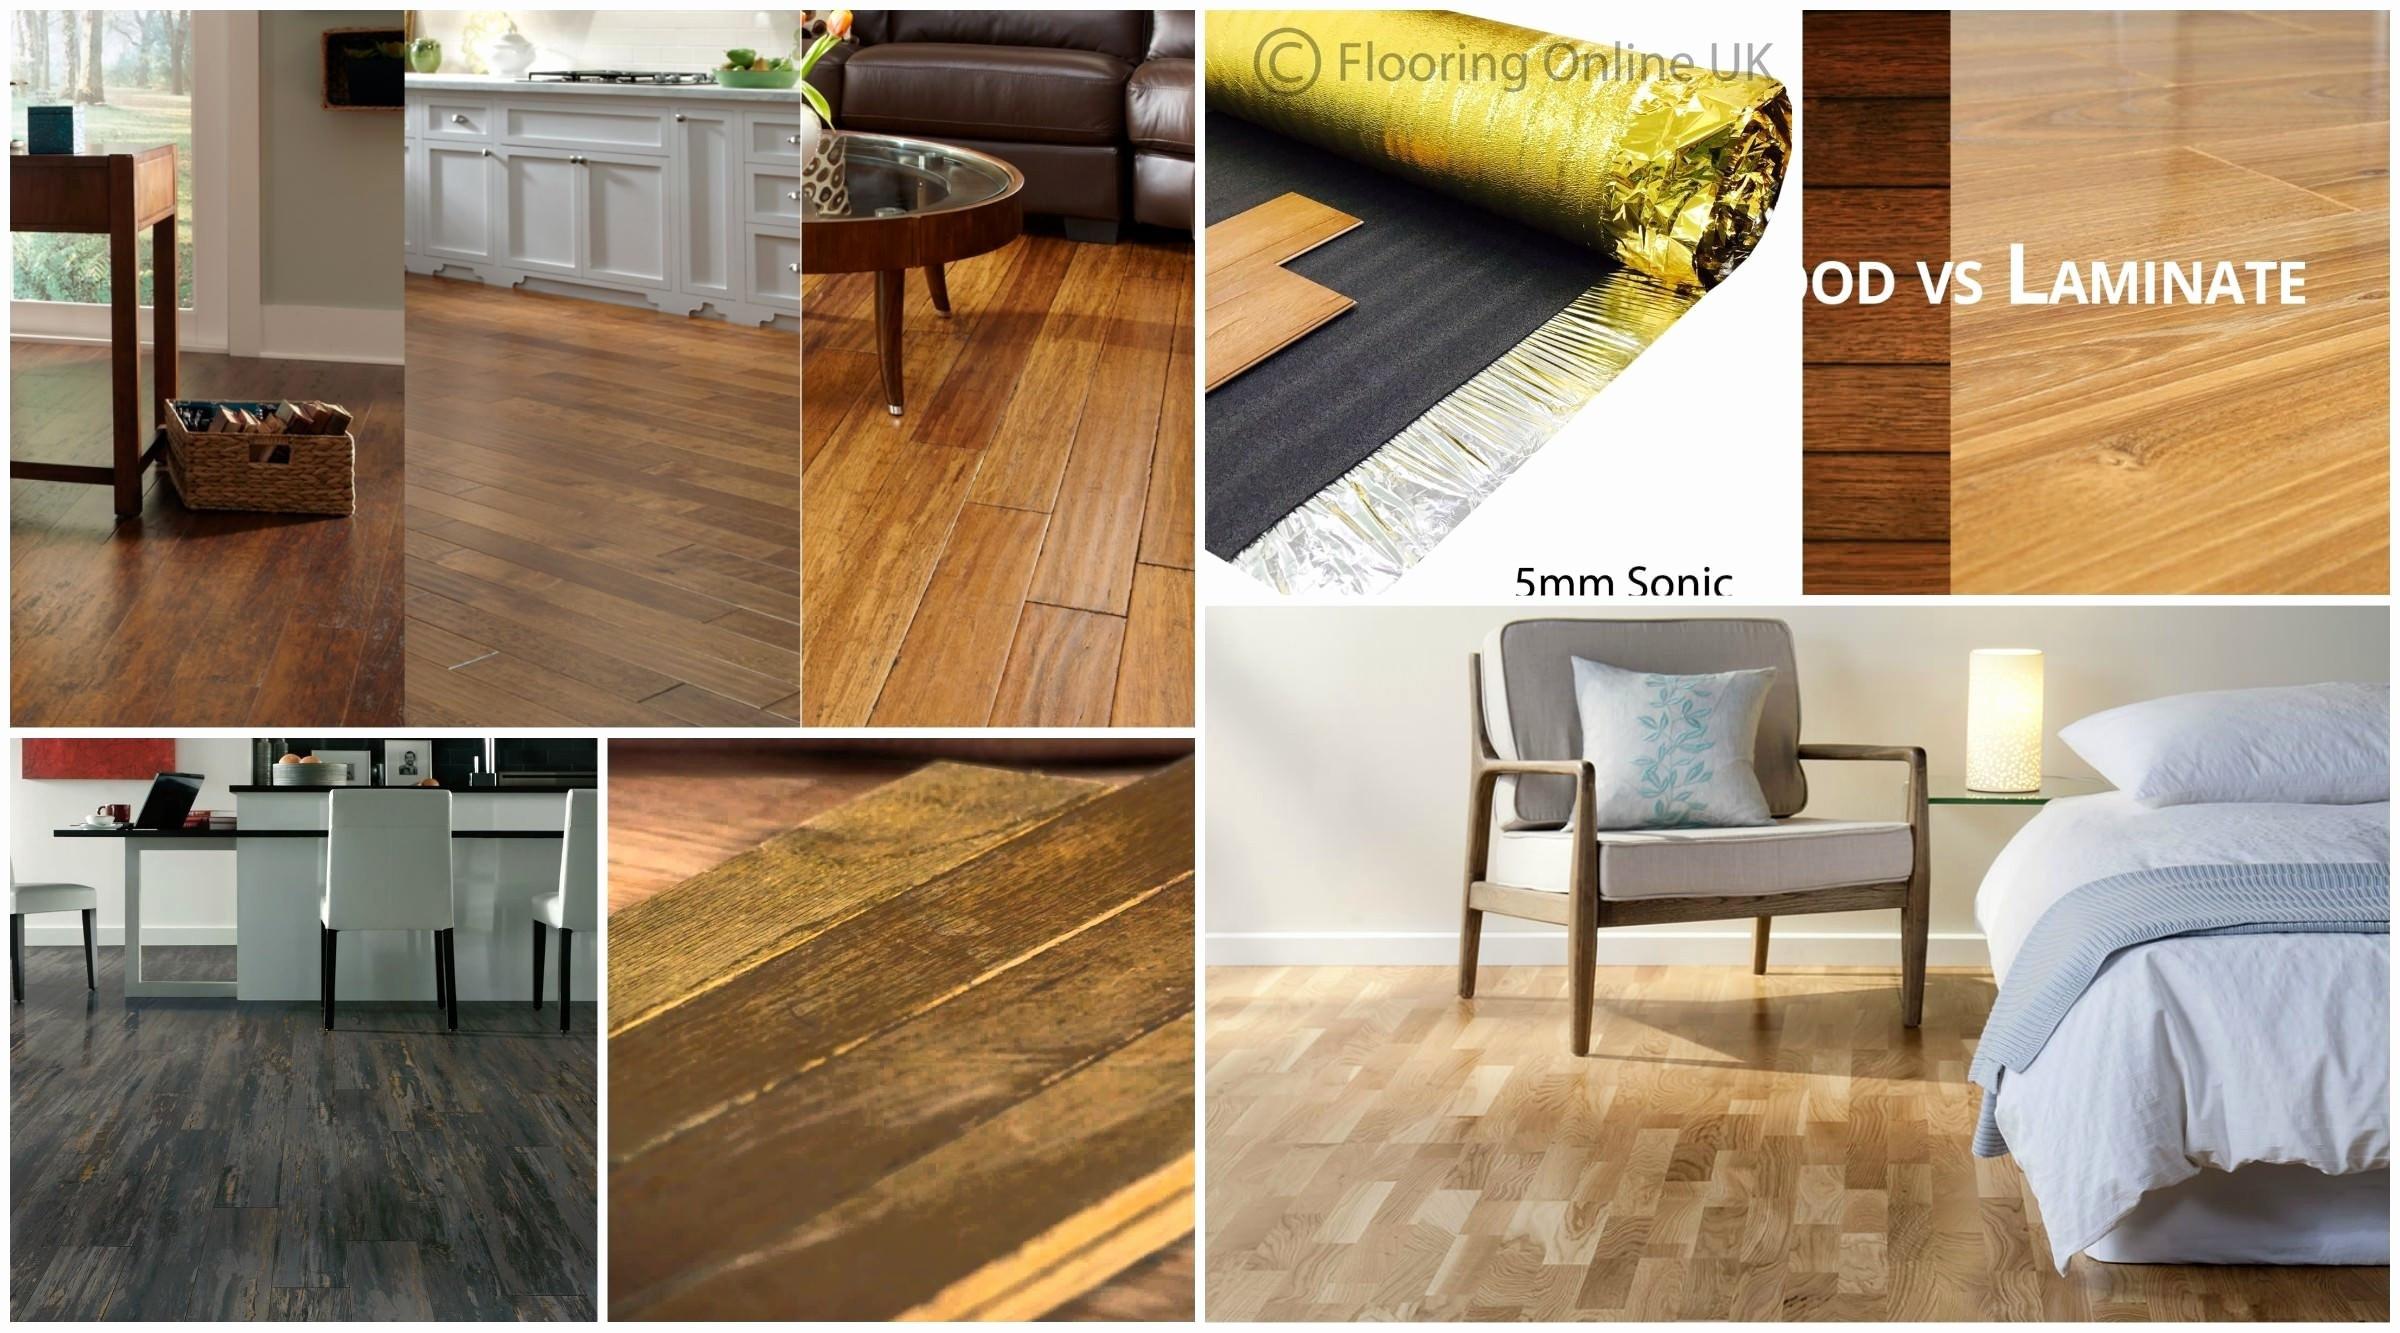 Lowes Hardwood Flooring Of 17 Inspirational Lowes Carpet Installation Photos Dizpos Com Throughout 50 Inspirational Vinyl Wood Flooring Lowes Pics 50 S